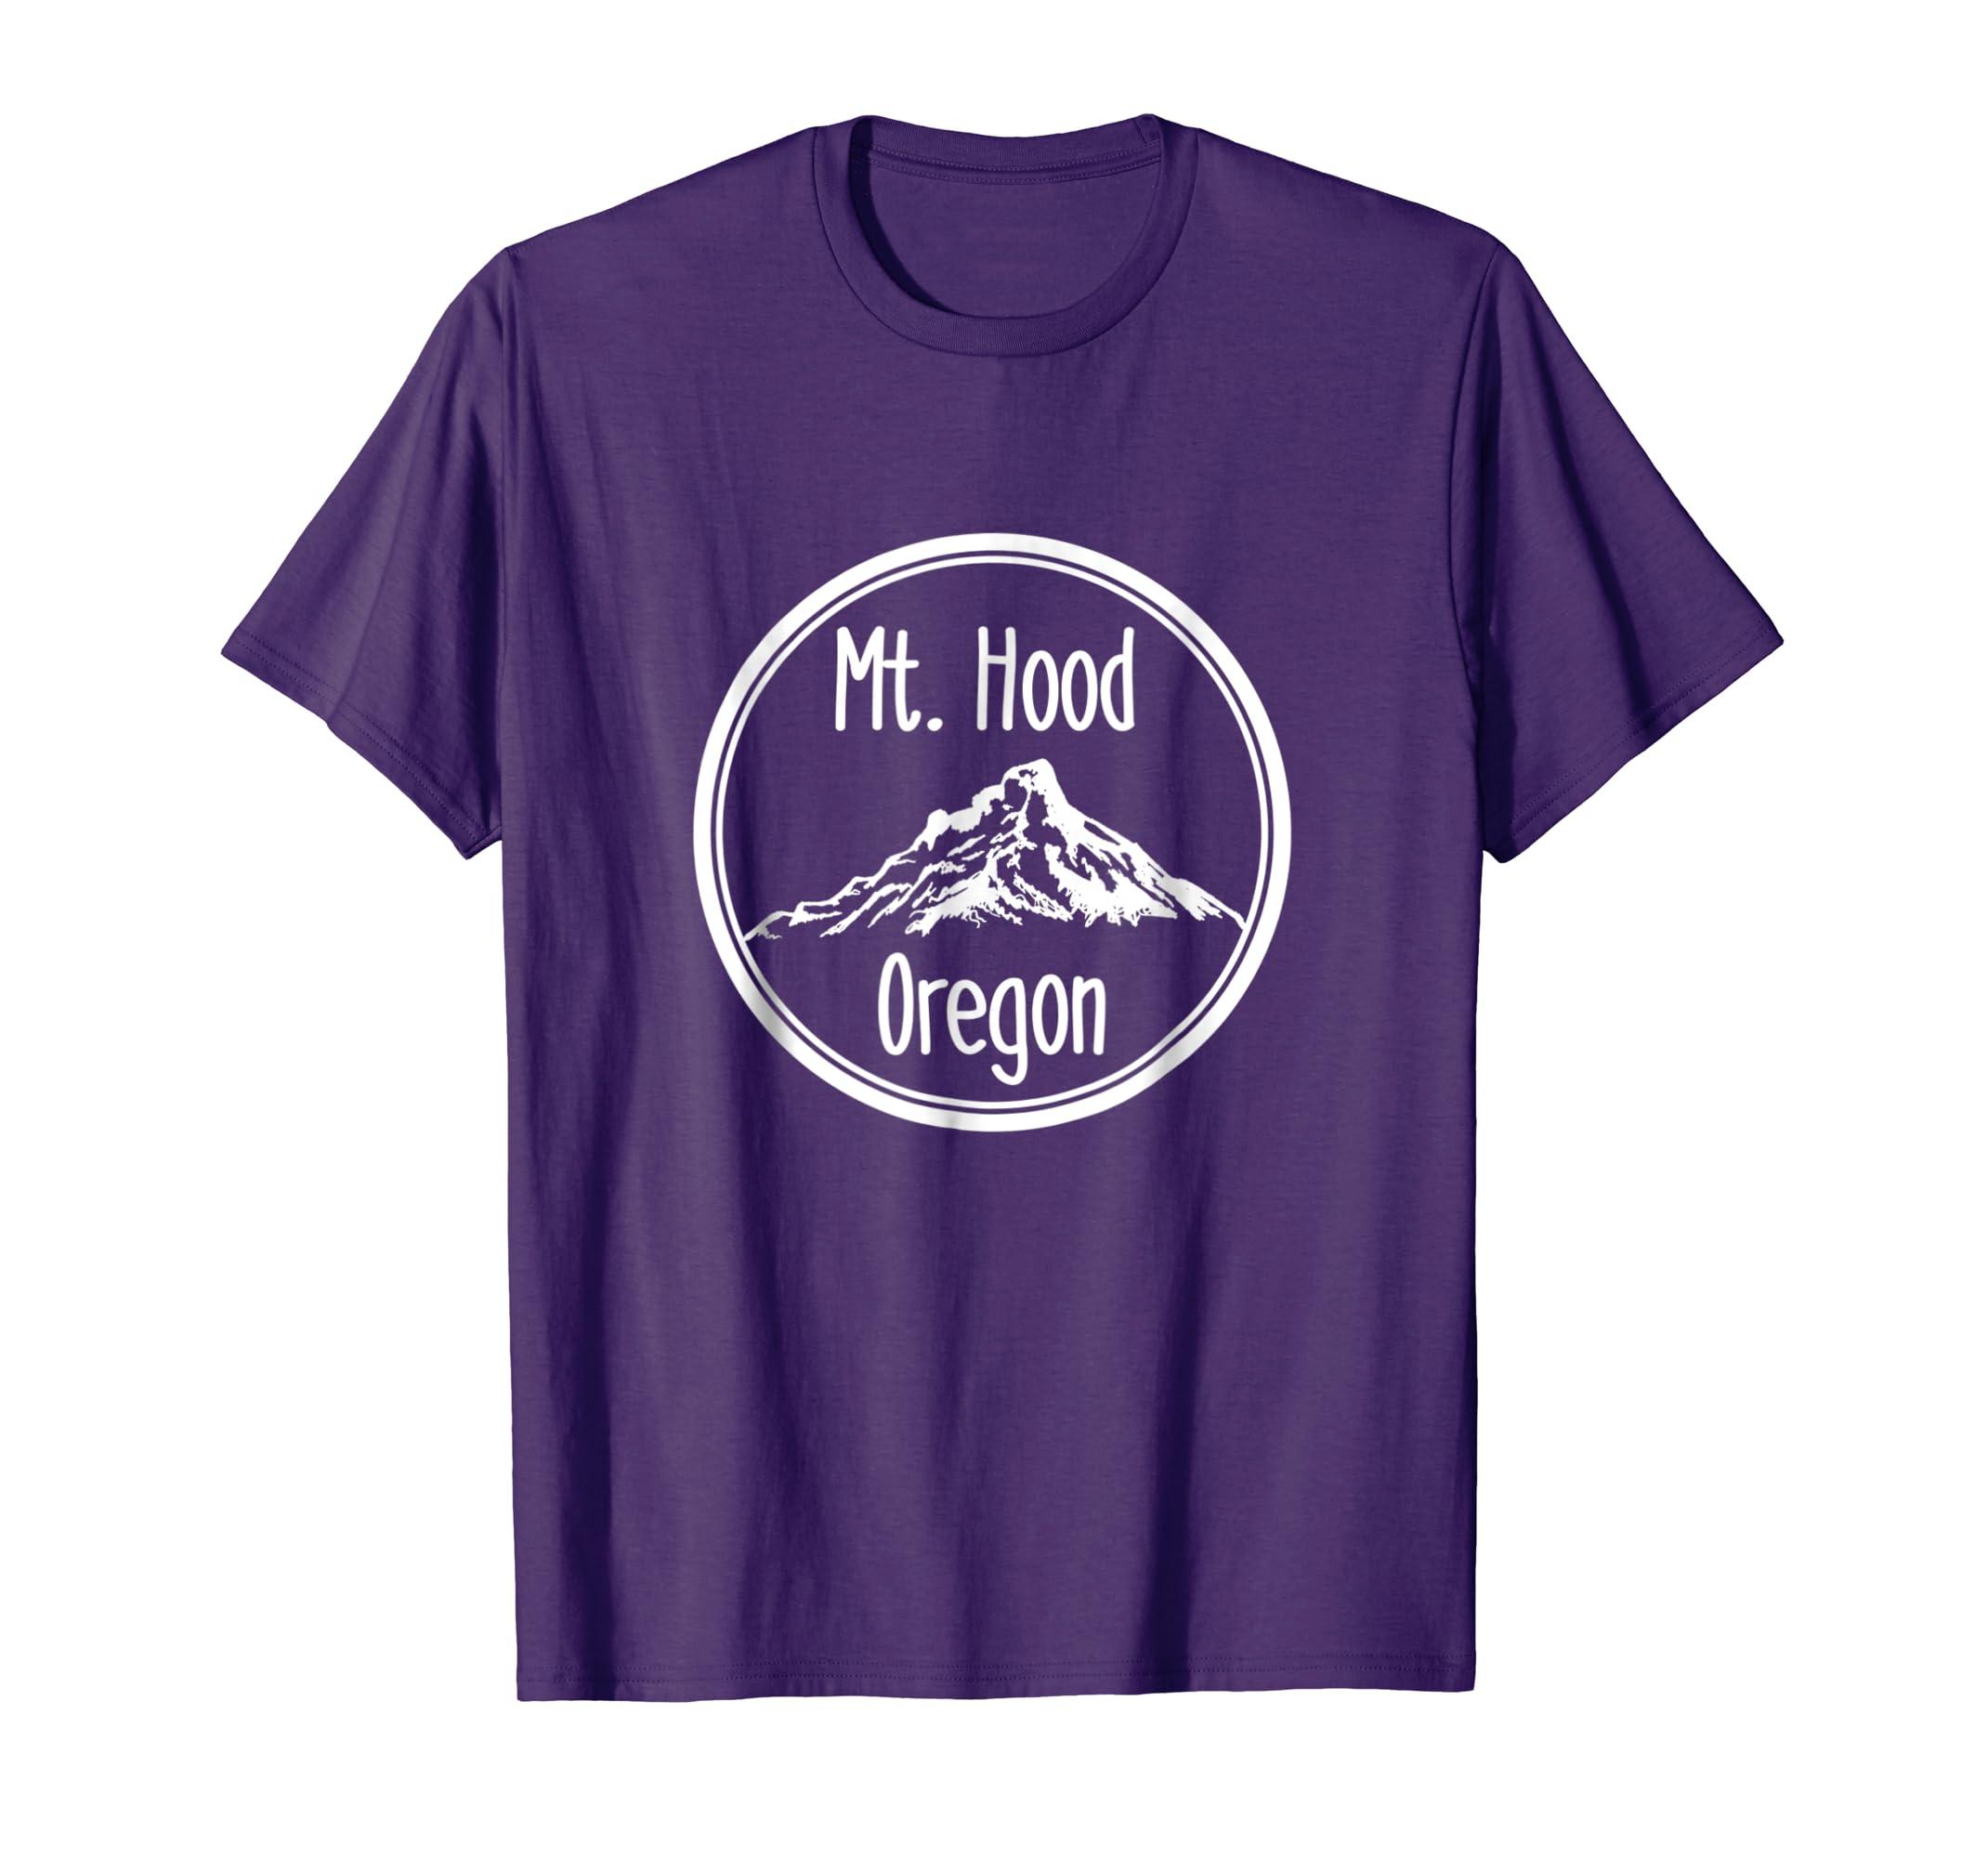 ace94a526db Amazon.com  Mt Hood Oregon Shirt Mount Hood Outdoor Adventures Tee  Clothing